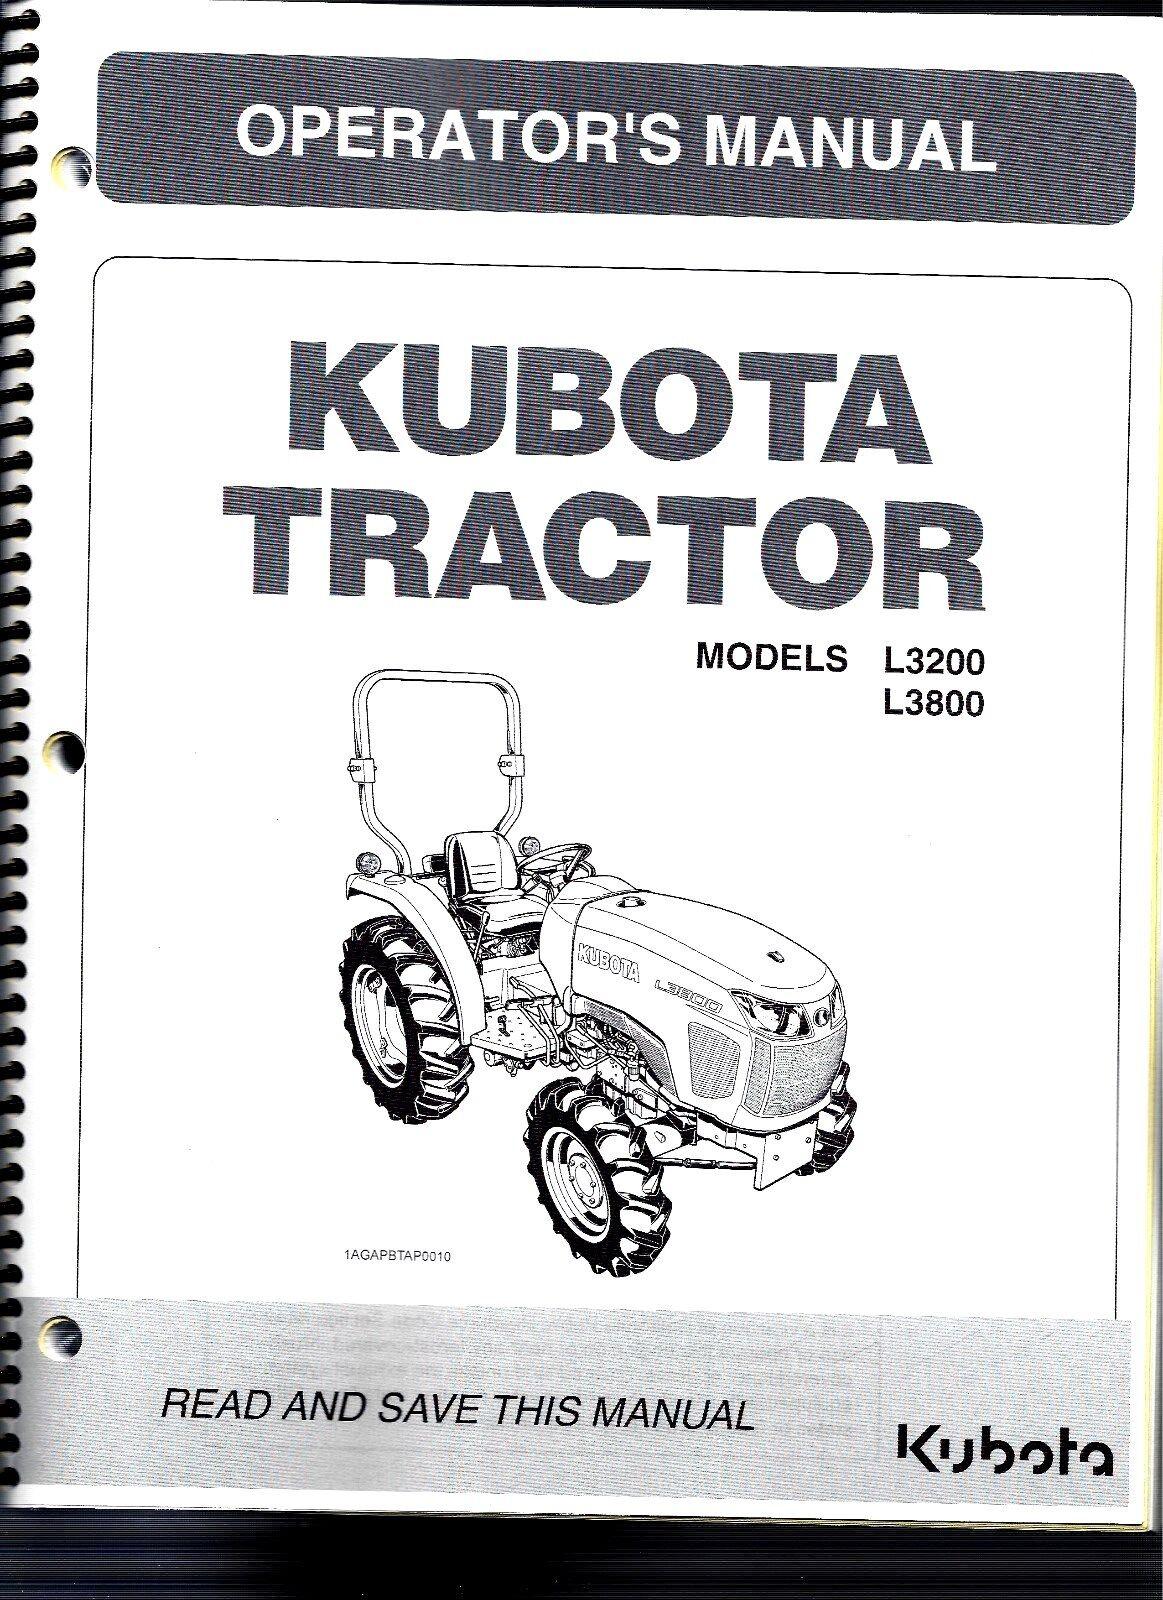 kubota l3200 l3800 tractor operator s manual ebay rh ebay com